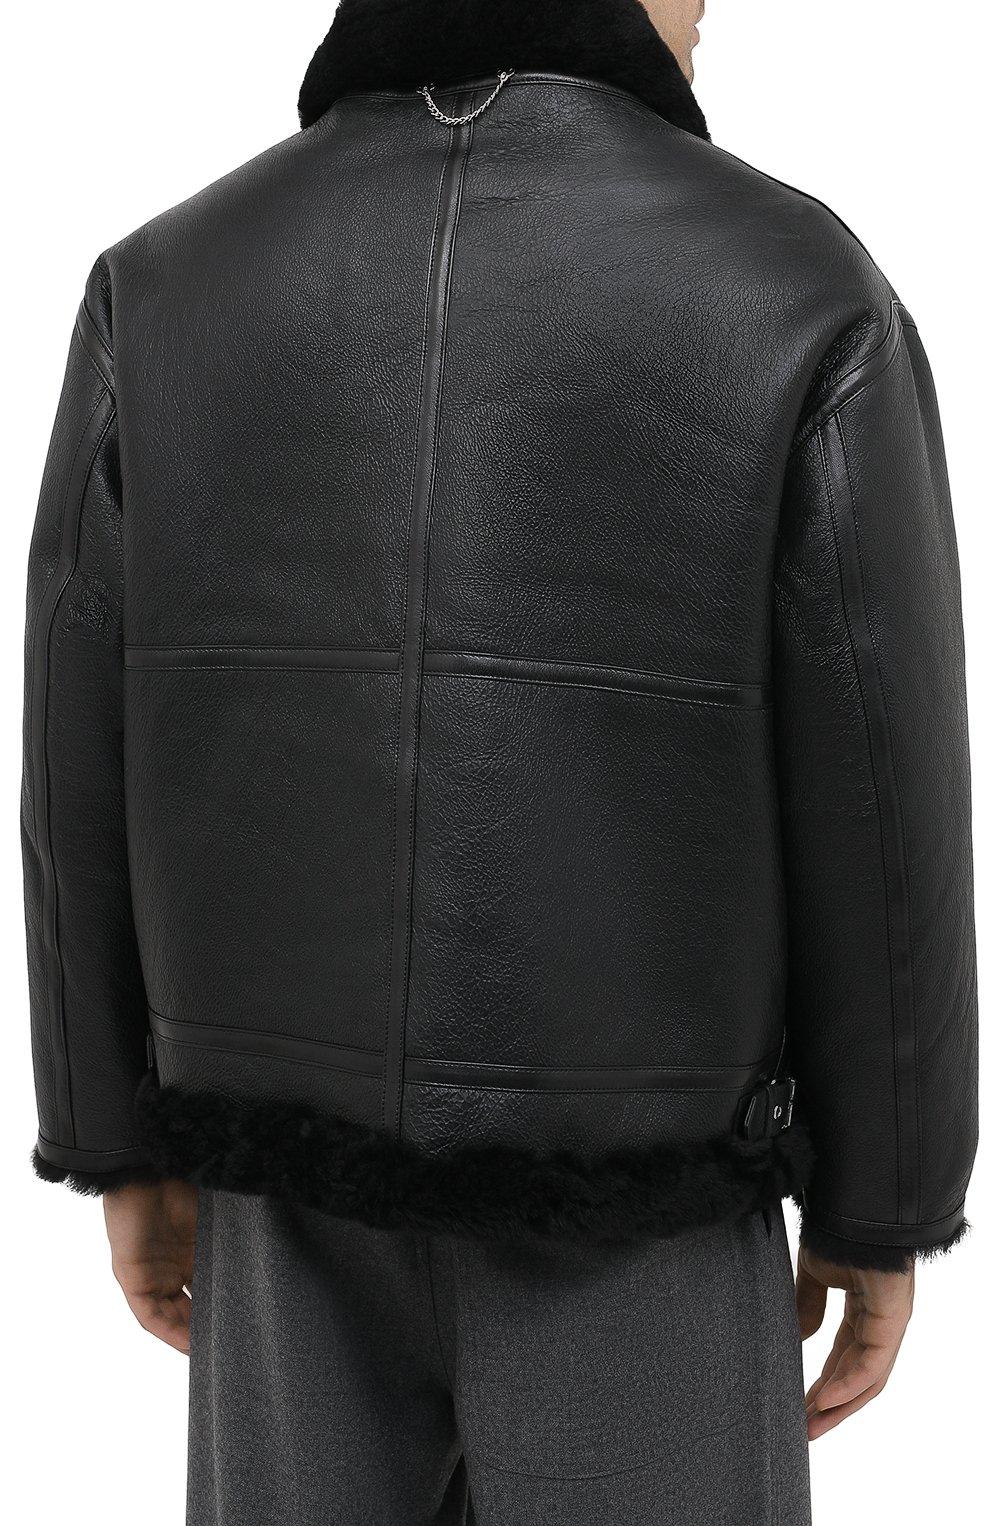 Мужская дубленка VETEMENTS черного цвета, арт. UAH21JA017 2403/M   Фото 5